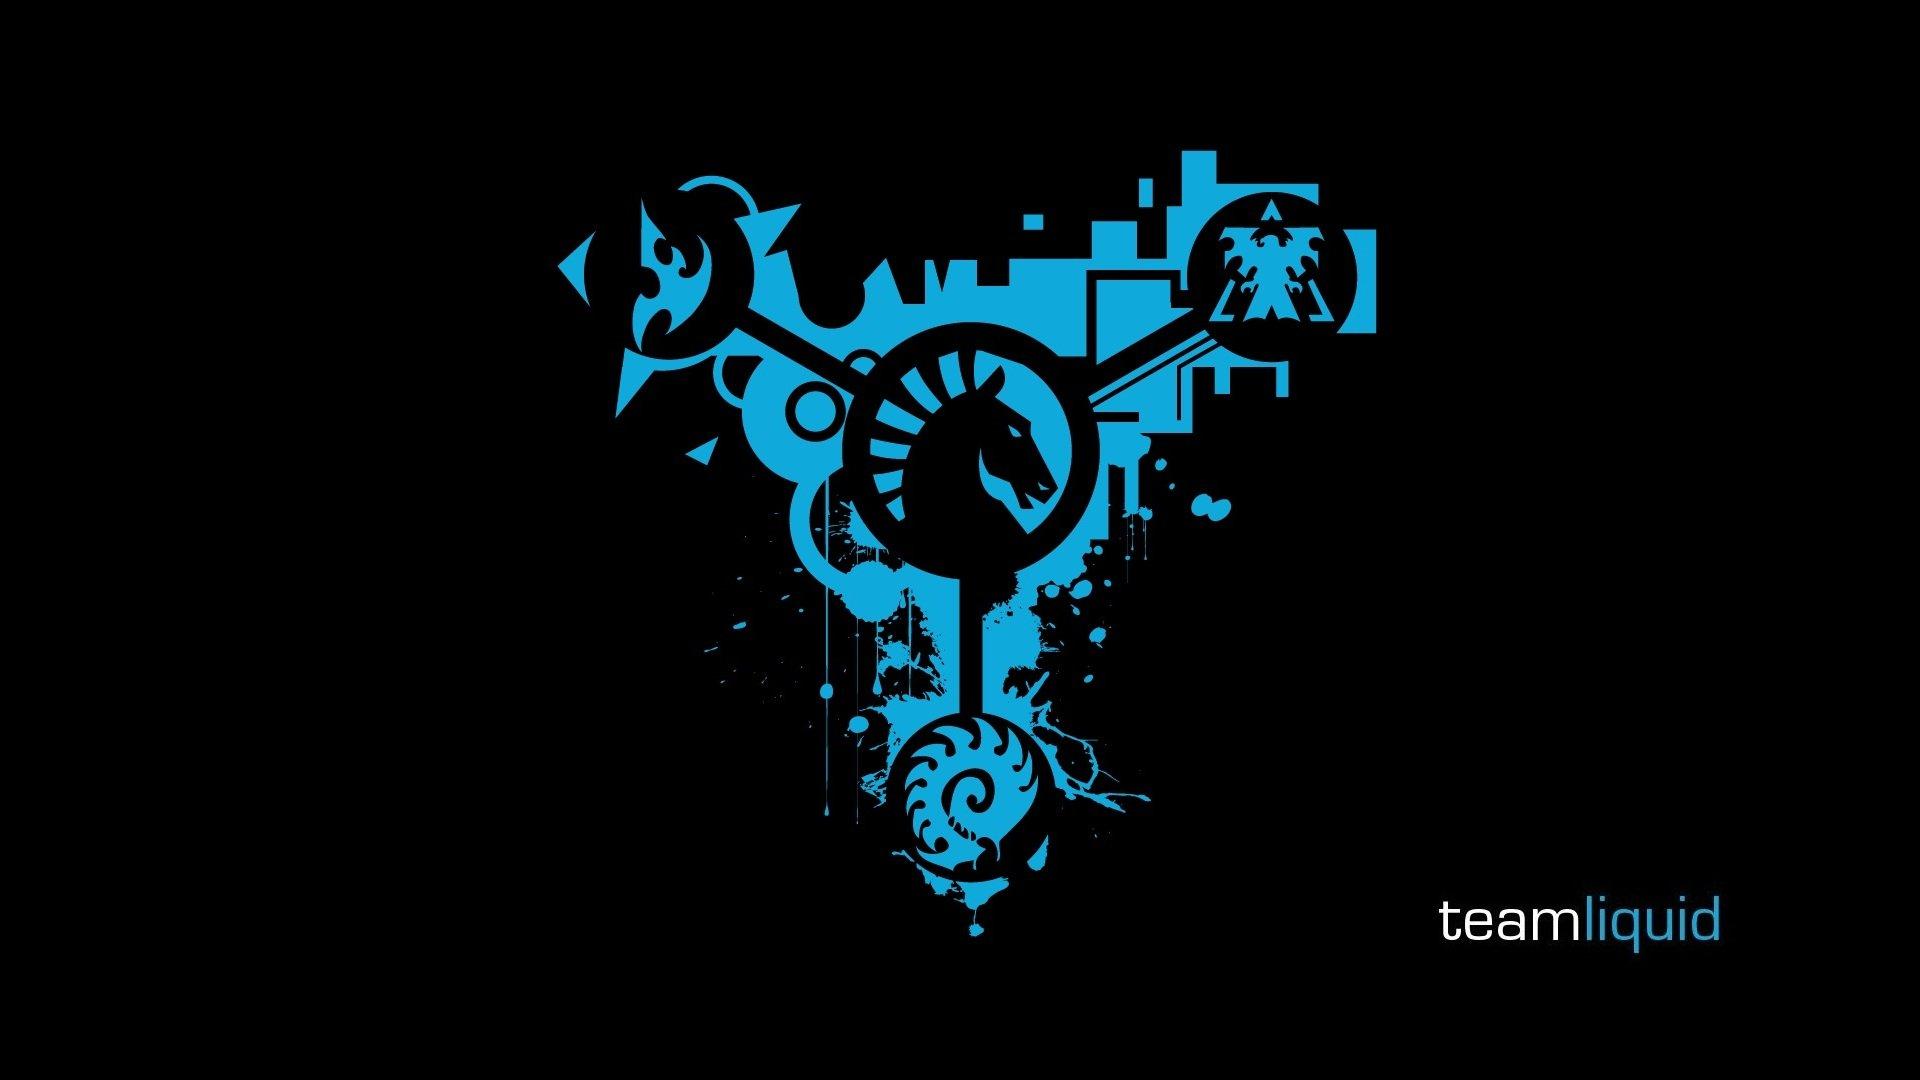 Logos Team Liquid StarCraft II Black Background Wallpaper